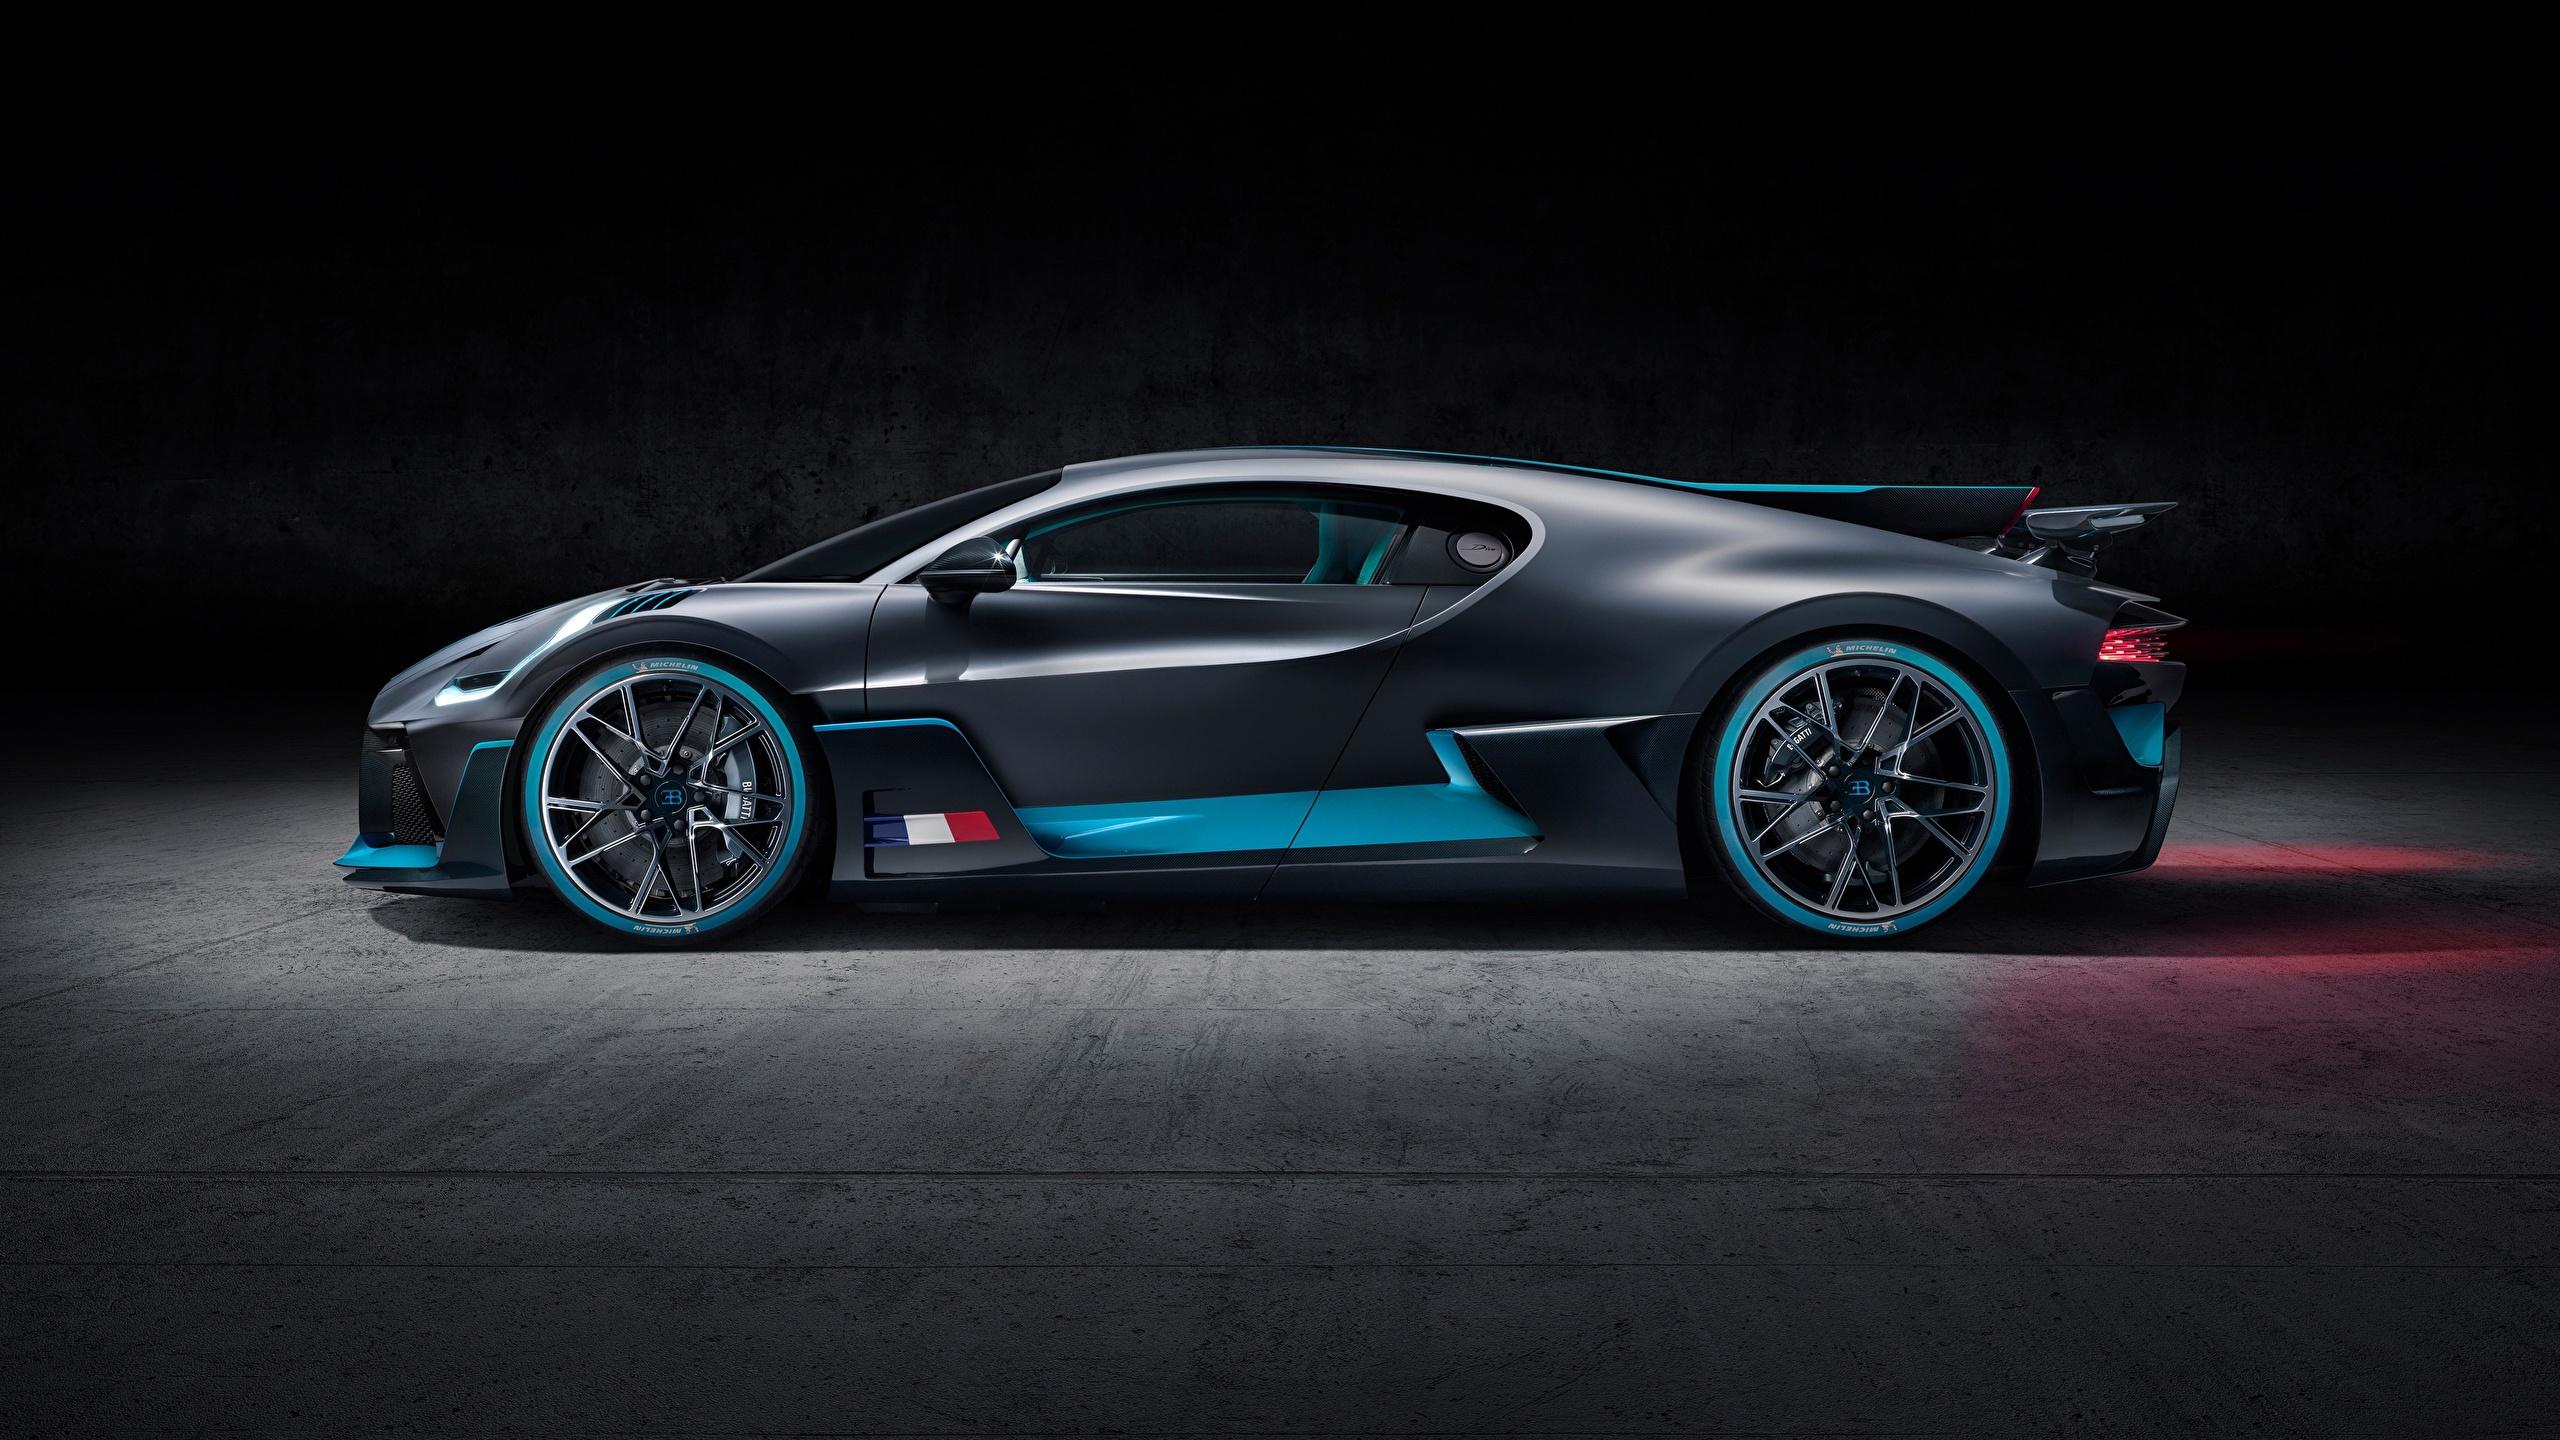 Fonds Decran 2560x1440 Bugatti Divo Latéralement Noir